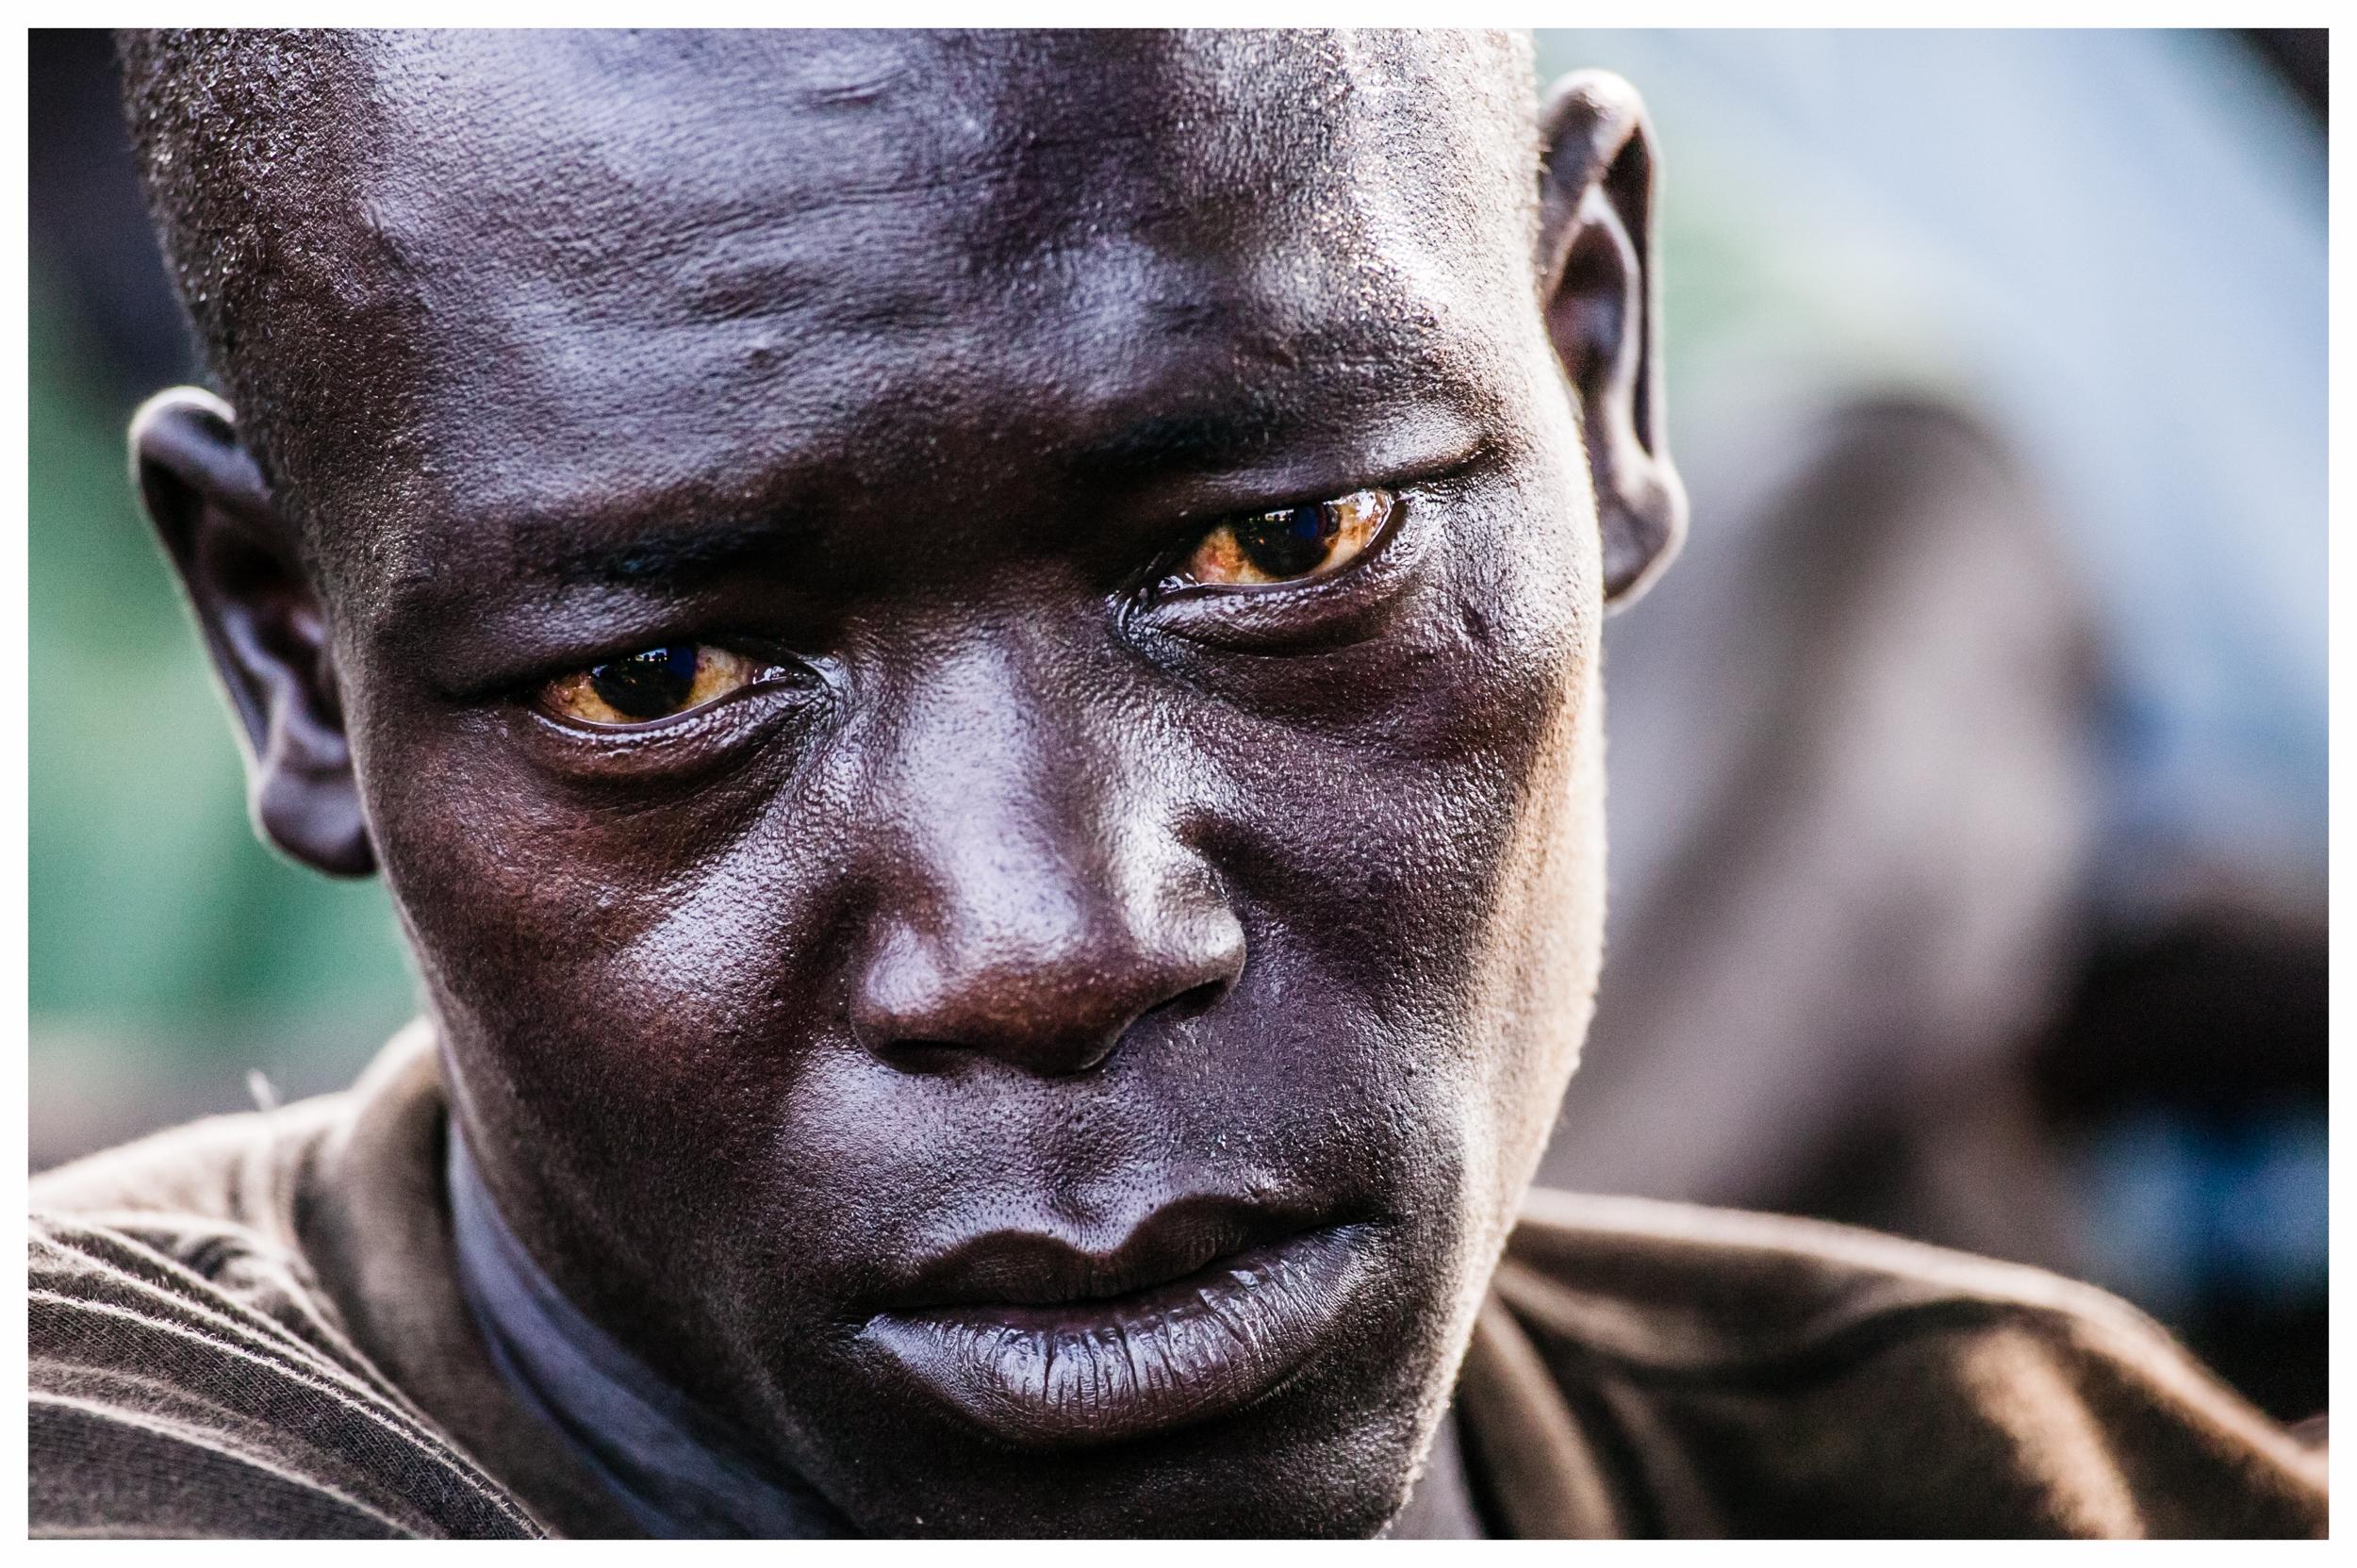 Charles Banya, former LRA rebel. Photo © Marcus Perkins